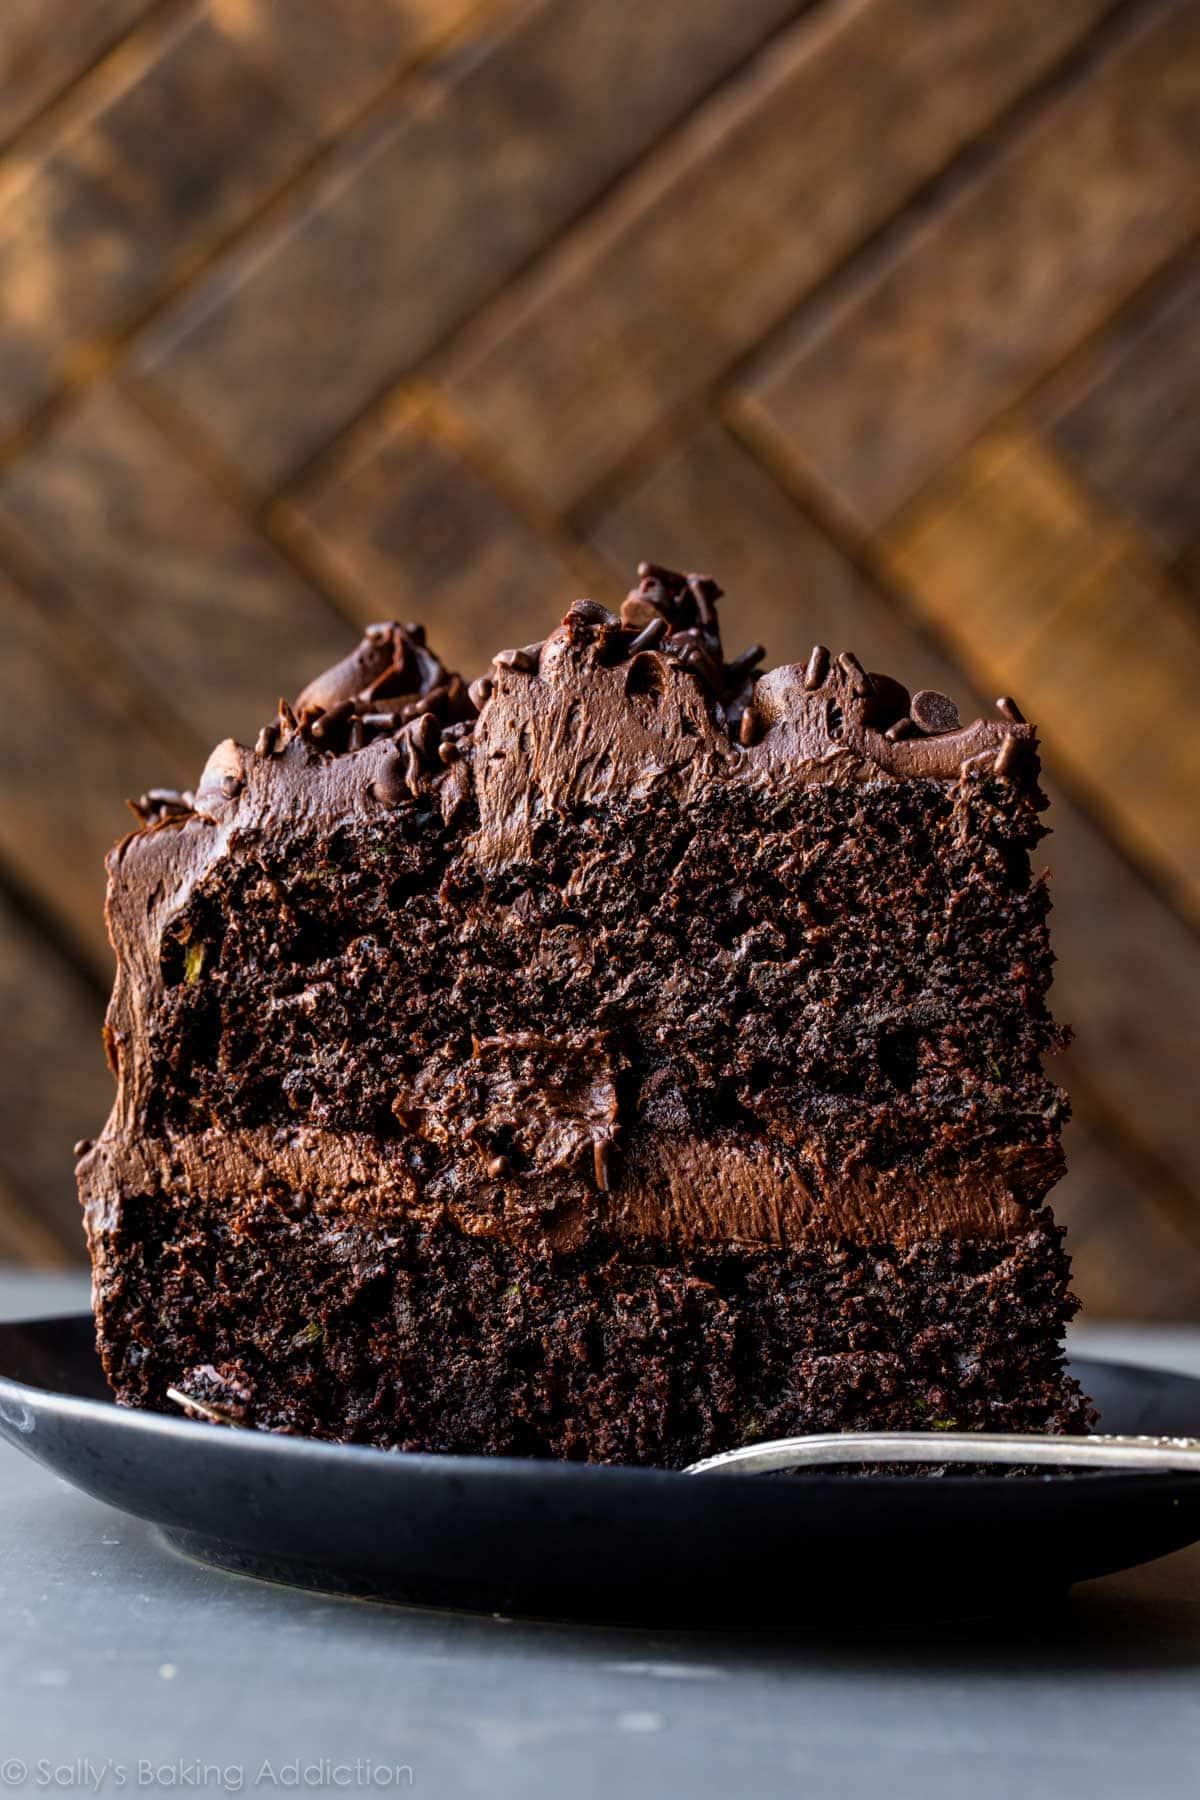 25 Drool-Worthy Chocolate Cake Recipes: Chocolate Zucchini Cake